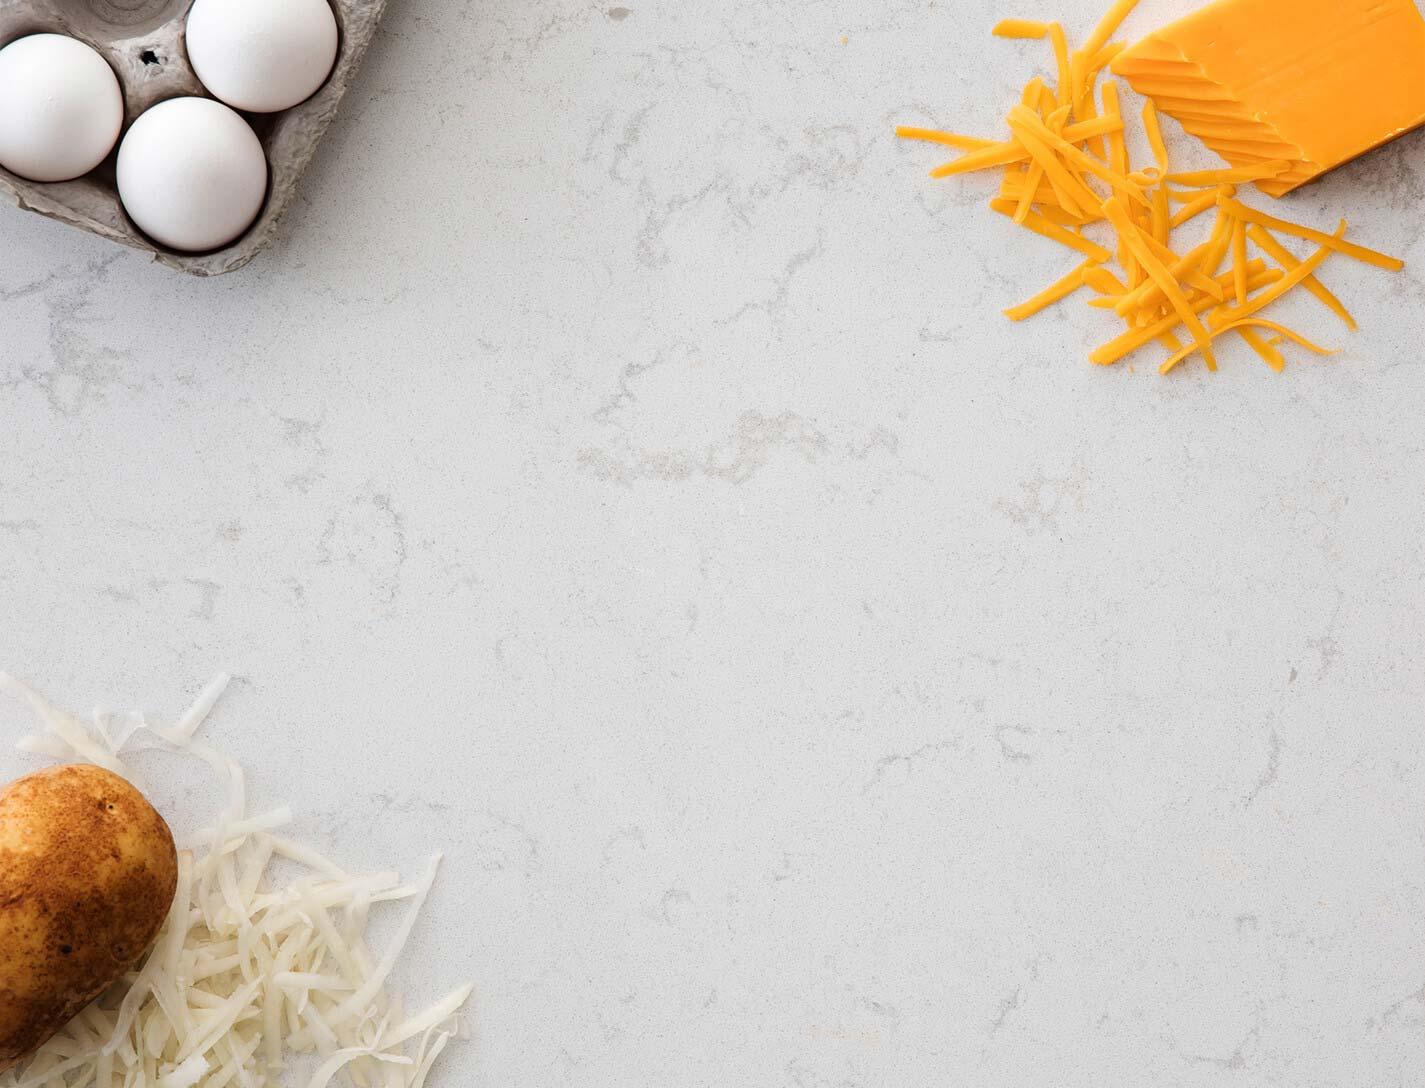 Bob Evans Sausage Egg & Cheese Breakfast Bake